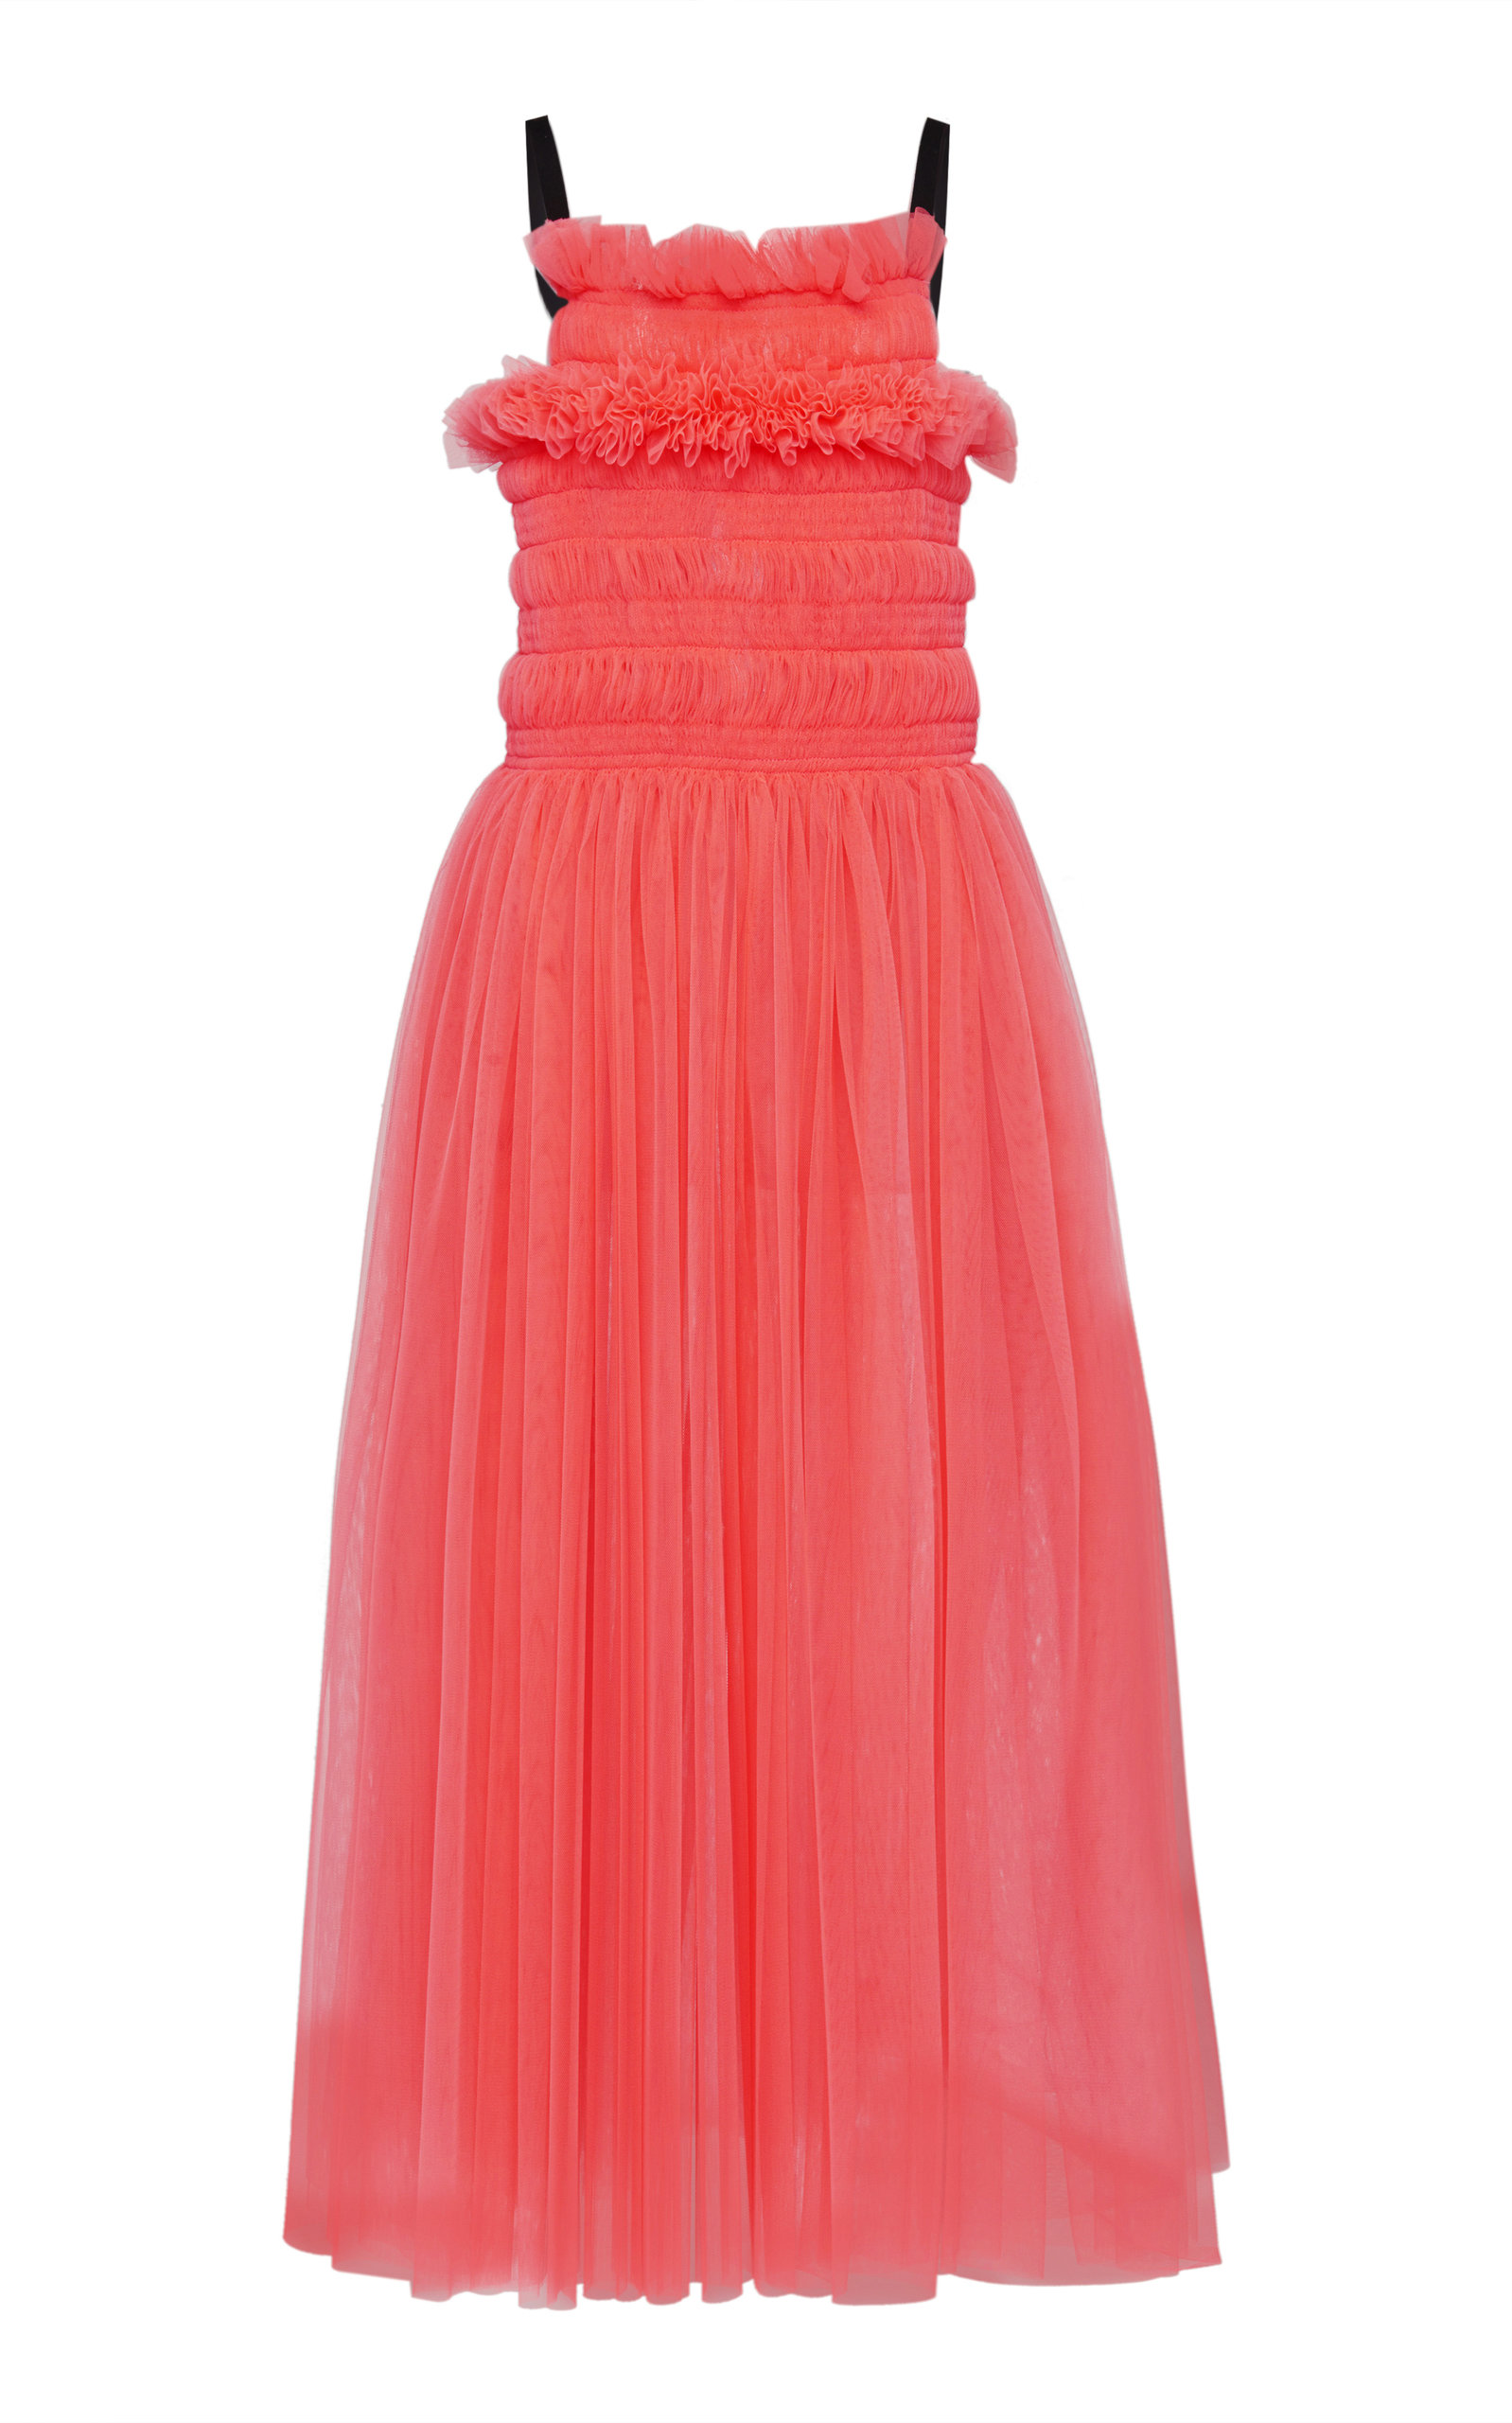 Molly Goddard | Molly Goddard Shelly Tie-Back Smocked Tulle Midi Dress | Clouty